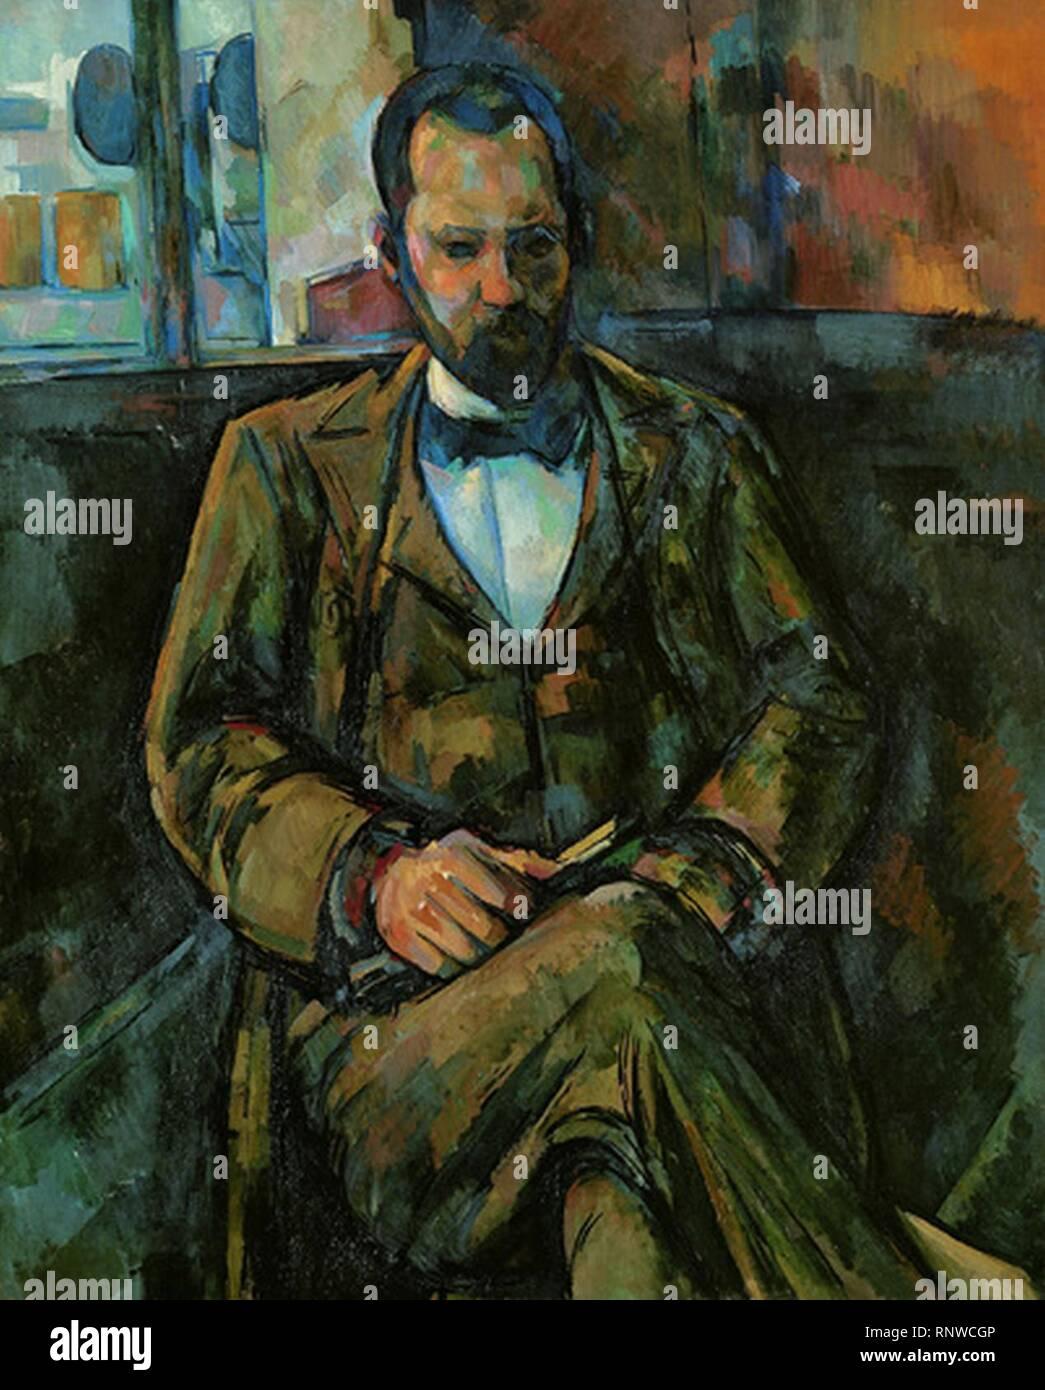 Cezanne Ambroise Vollard. - Stock Image